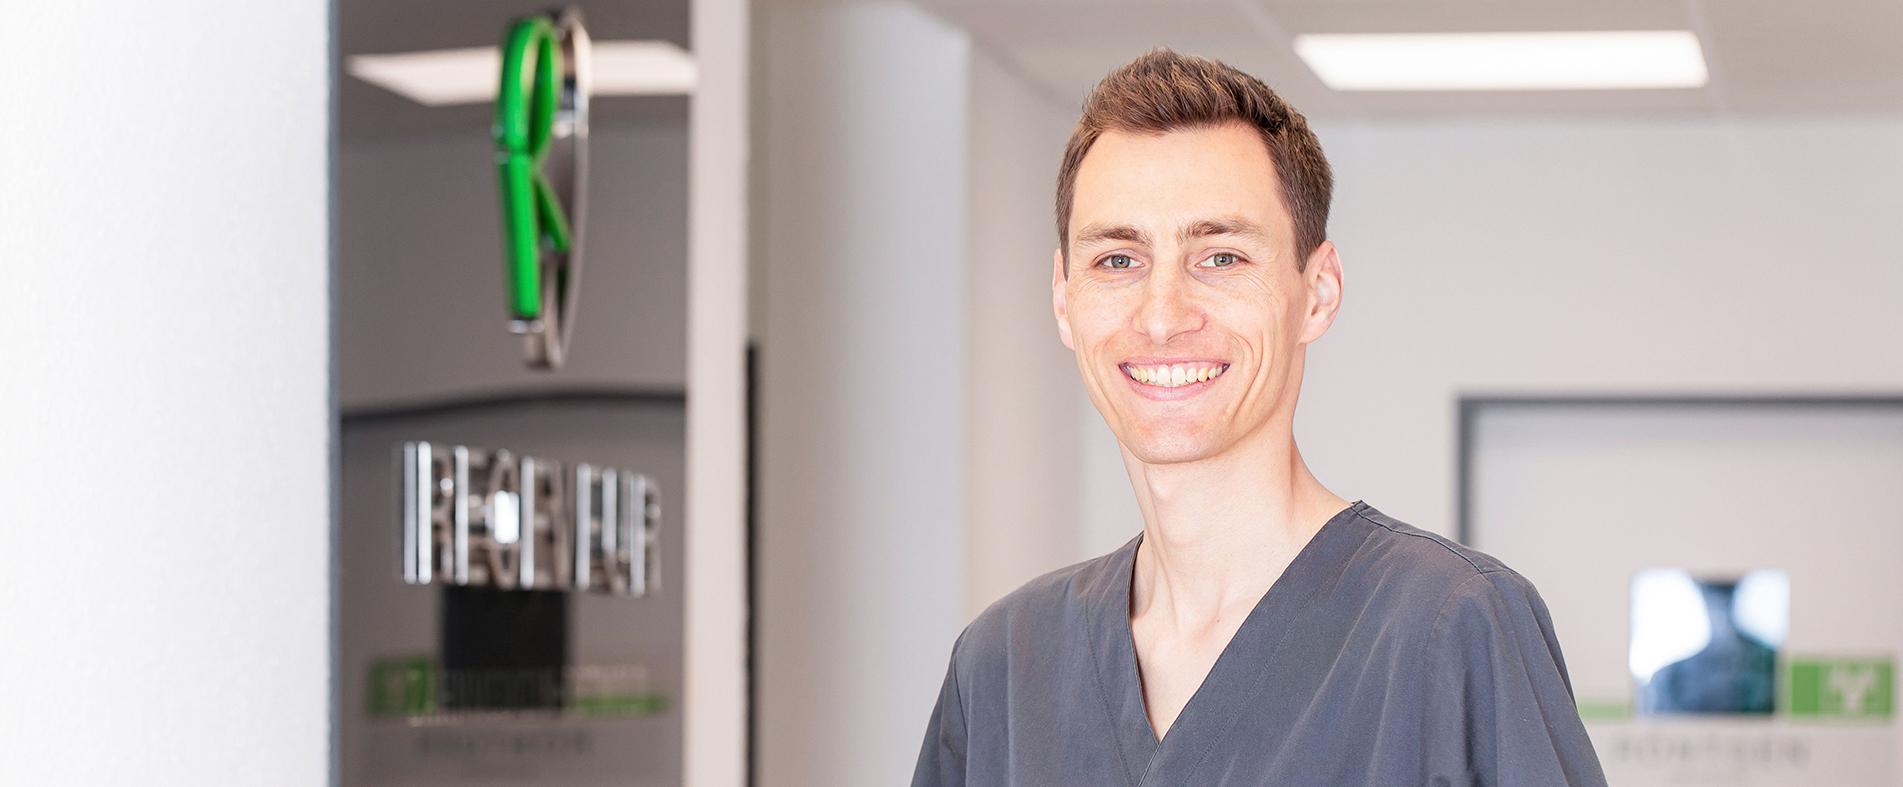 Dr. Jan Receveur - Kieferorthopäde in Detmold